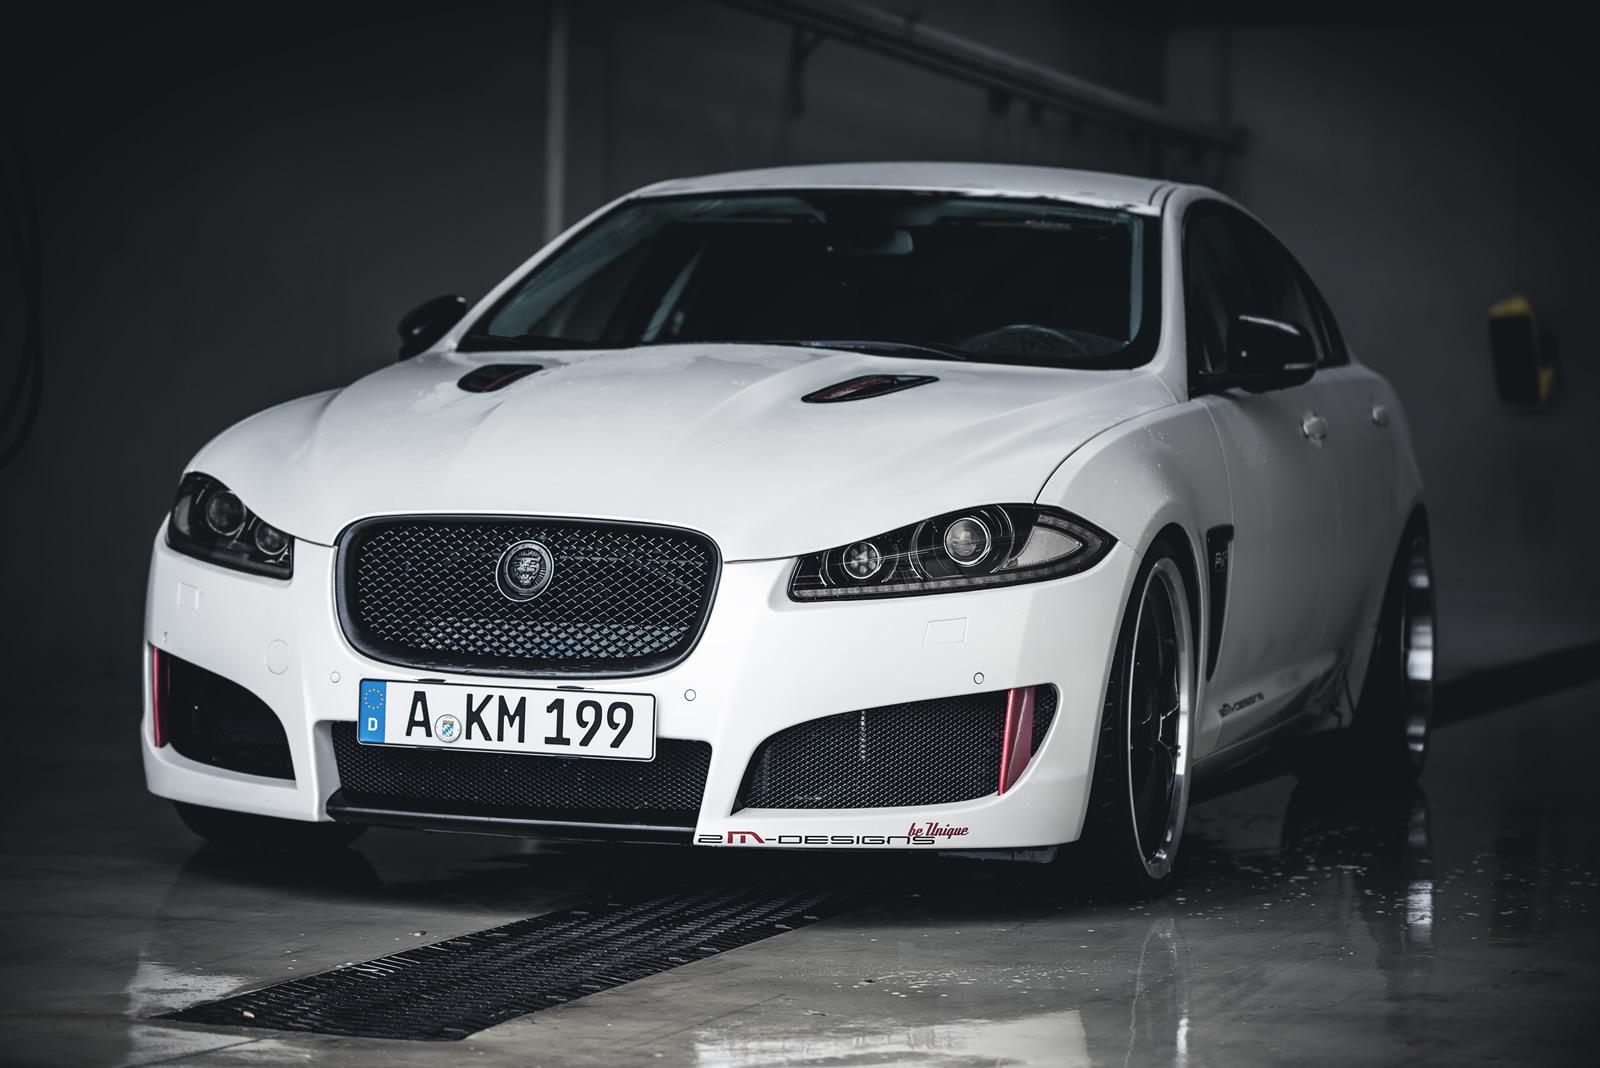 Jaguar Xf Complex Tuning Transformation By 2m Designs